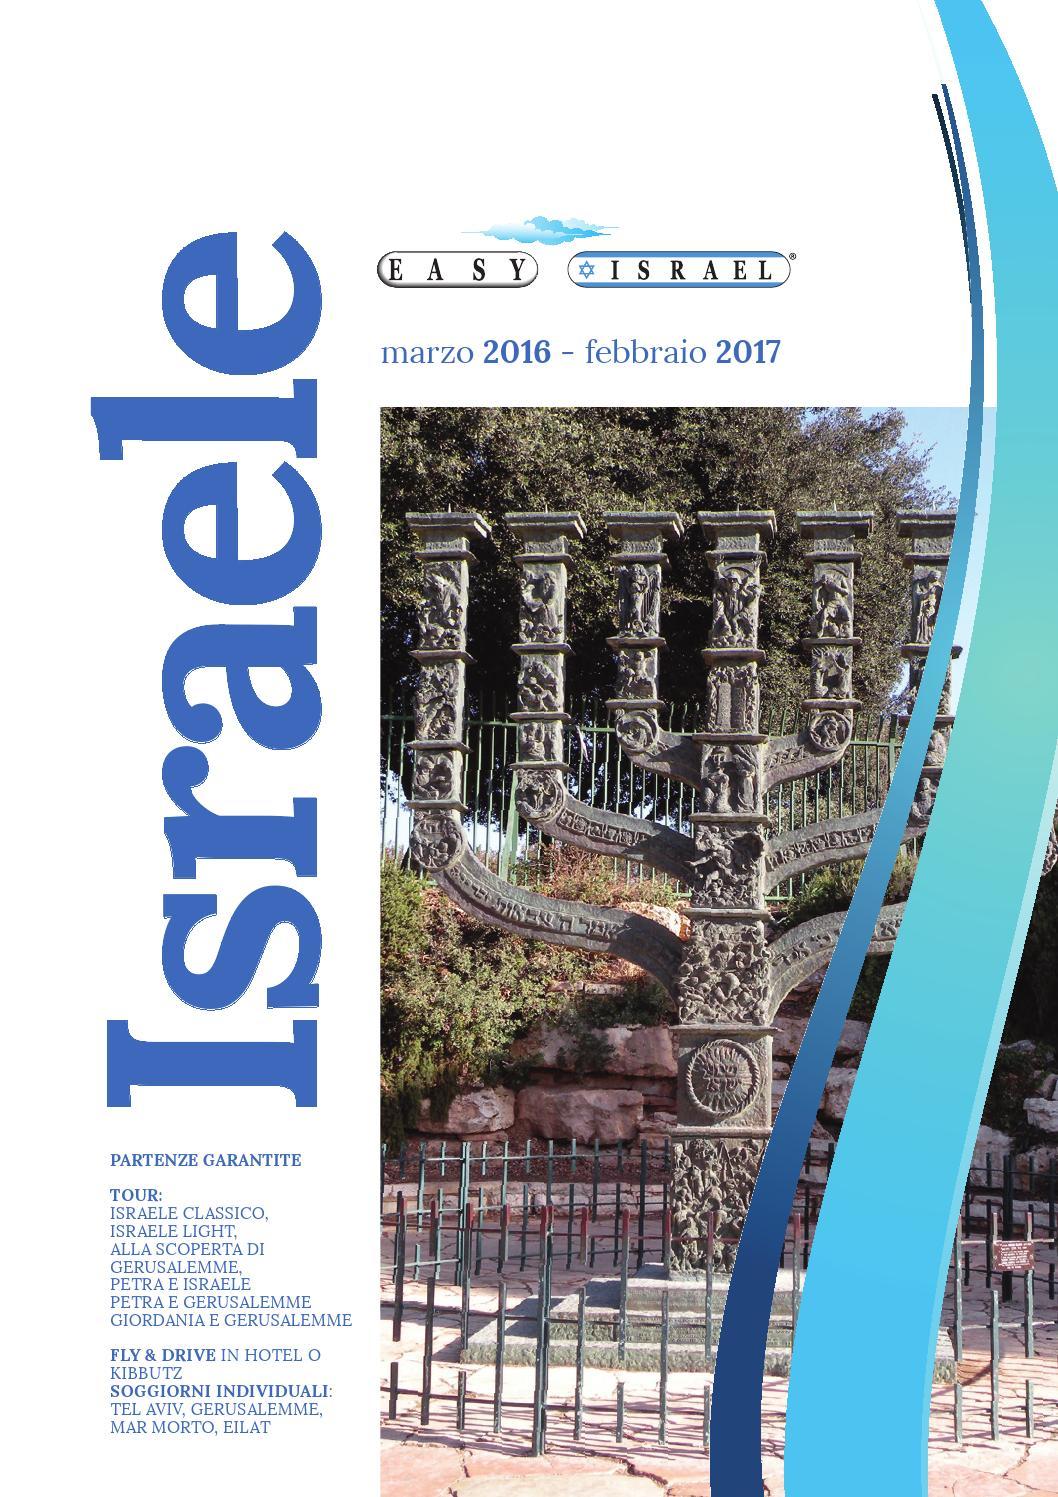 Easy Israel Catalogo 2016 by Easy Israel - issuu 64e45eb9c888